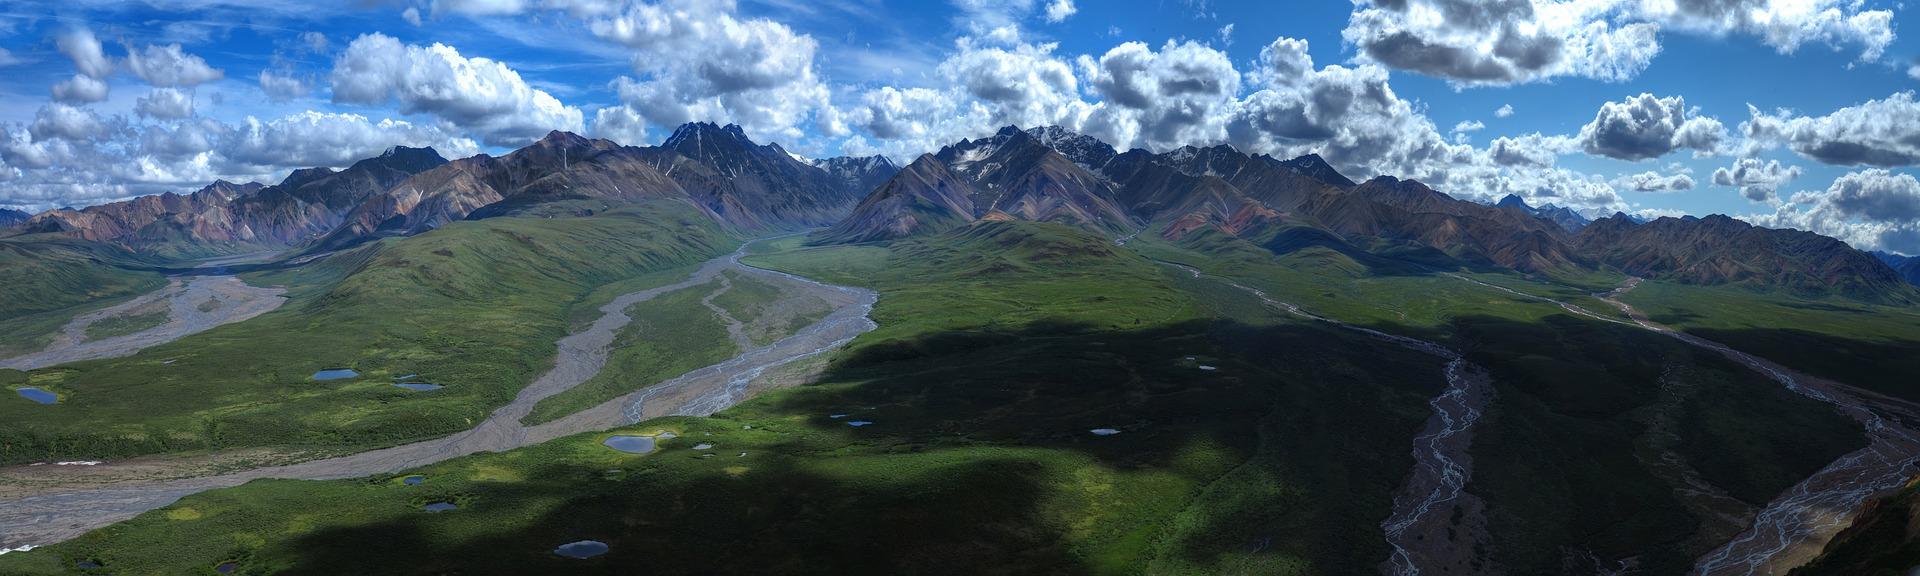 Discover Skagway Alaska